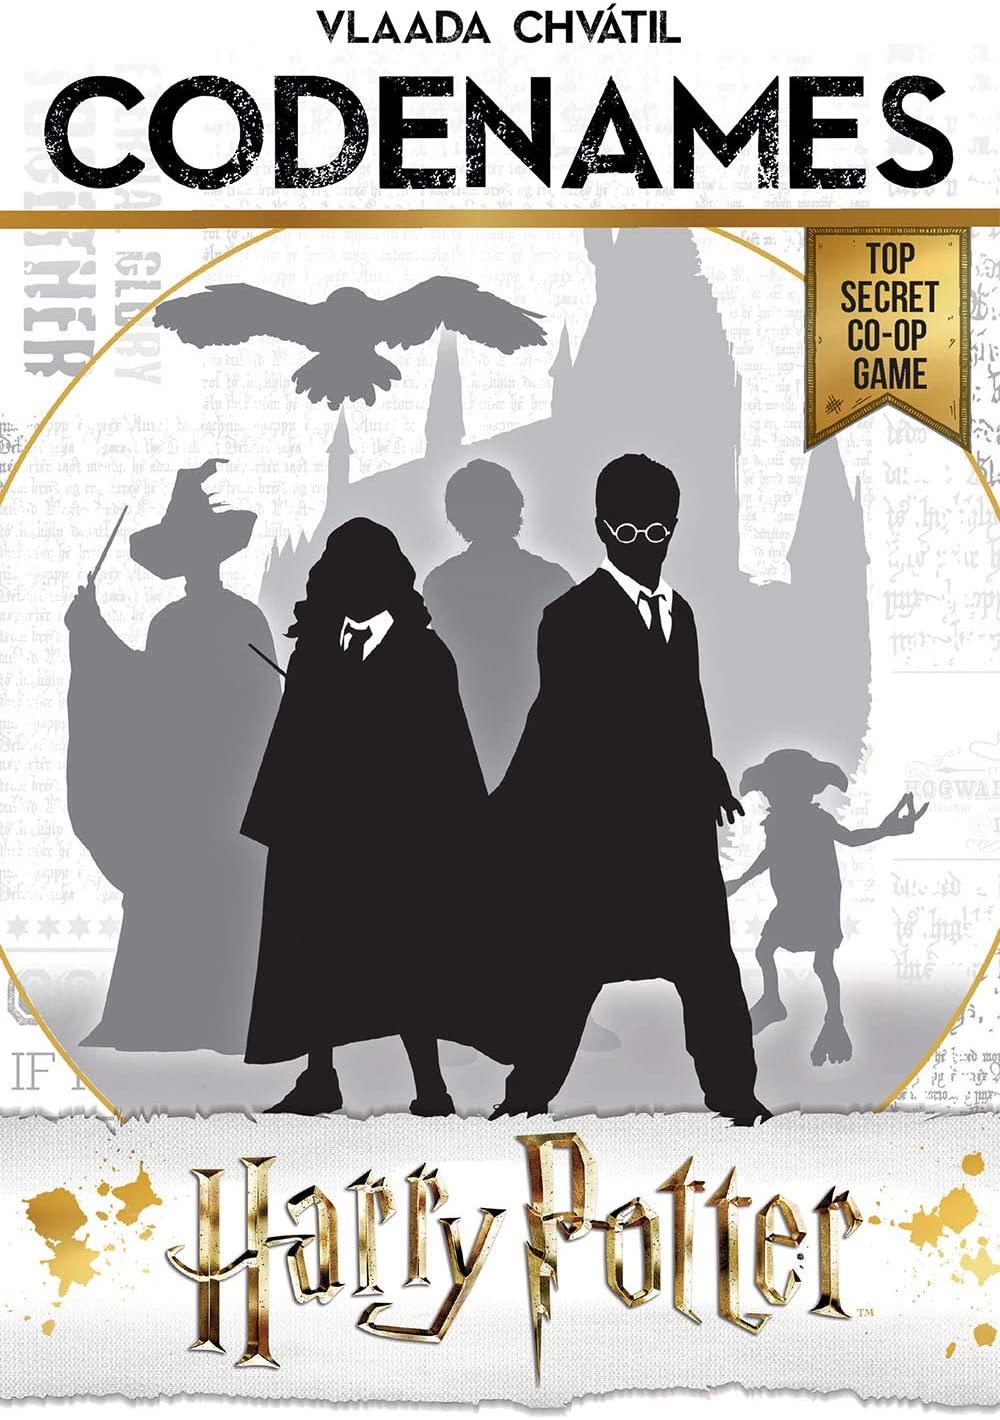 Codenames Disney + Harry Potter ($29.44) or Disney Family Edition ($12.21)